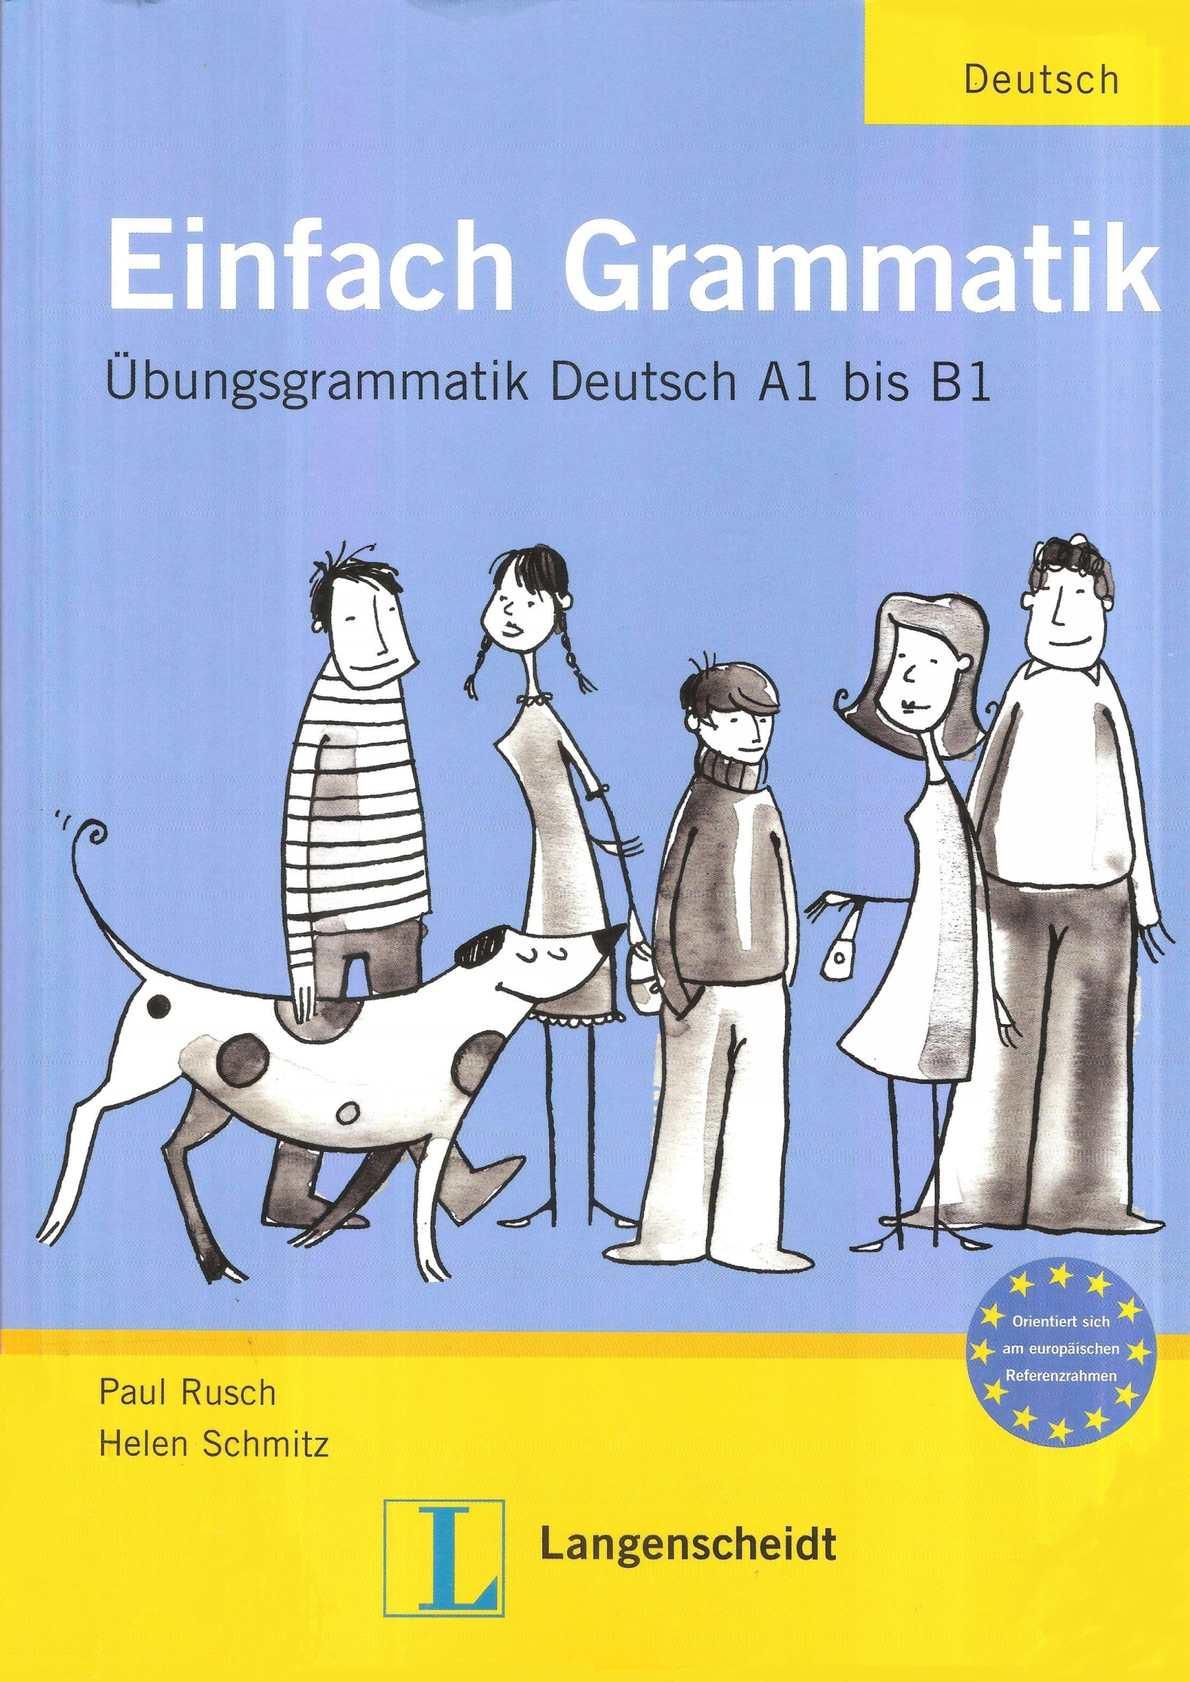 Einfach Grammatik Übungsgrammatik A1 bis B1